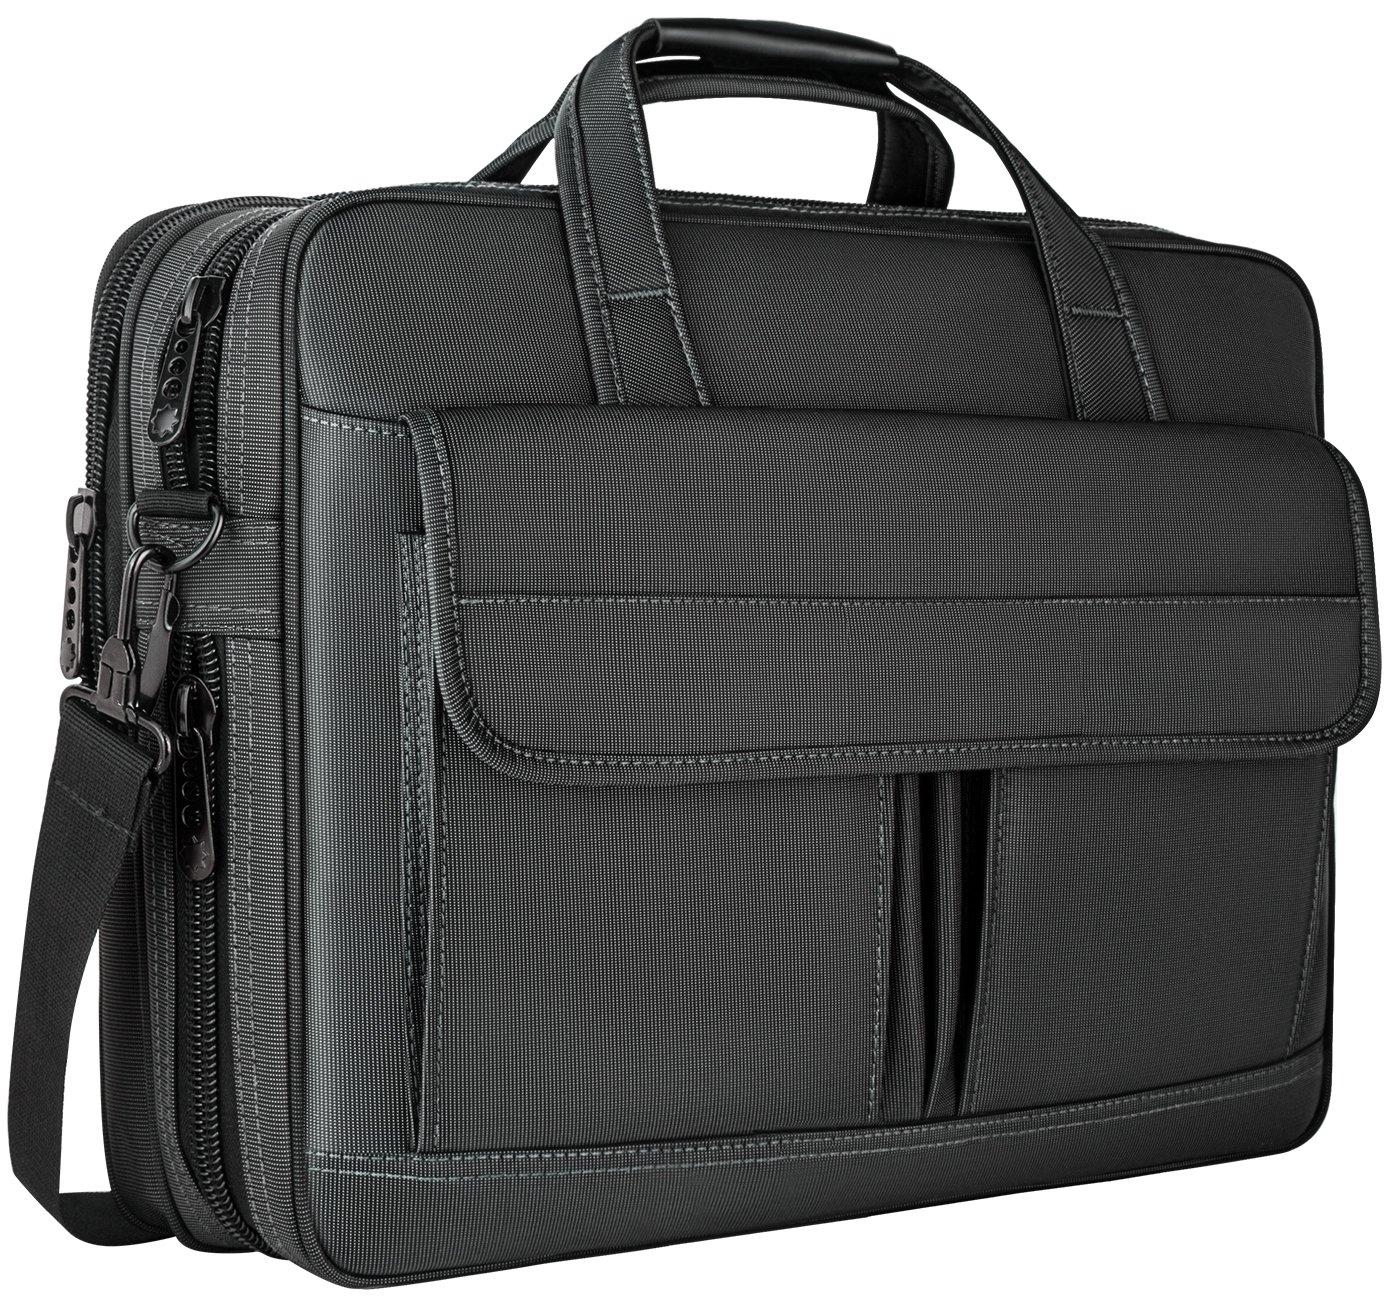 0aca3134be69 Taygeer Laptop Bag 15.6 Inch,Water Resistant Briefcase, 15inch ...